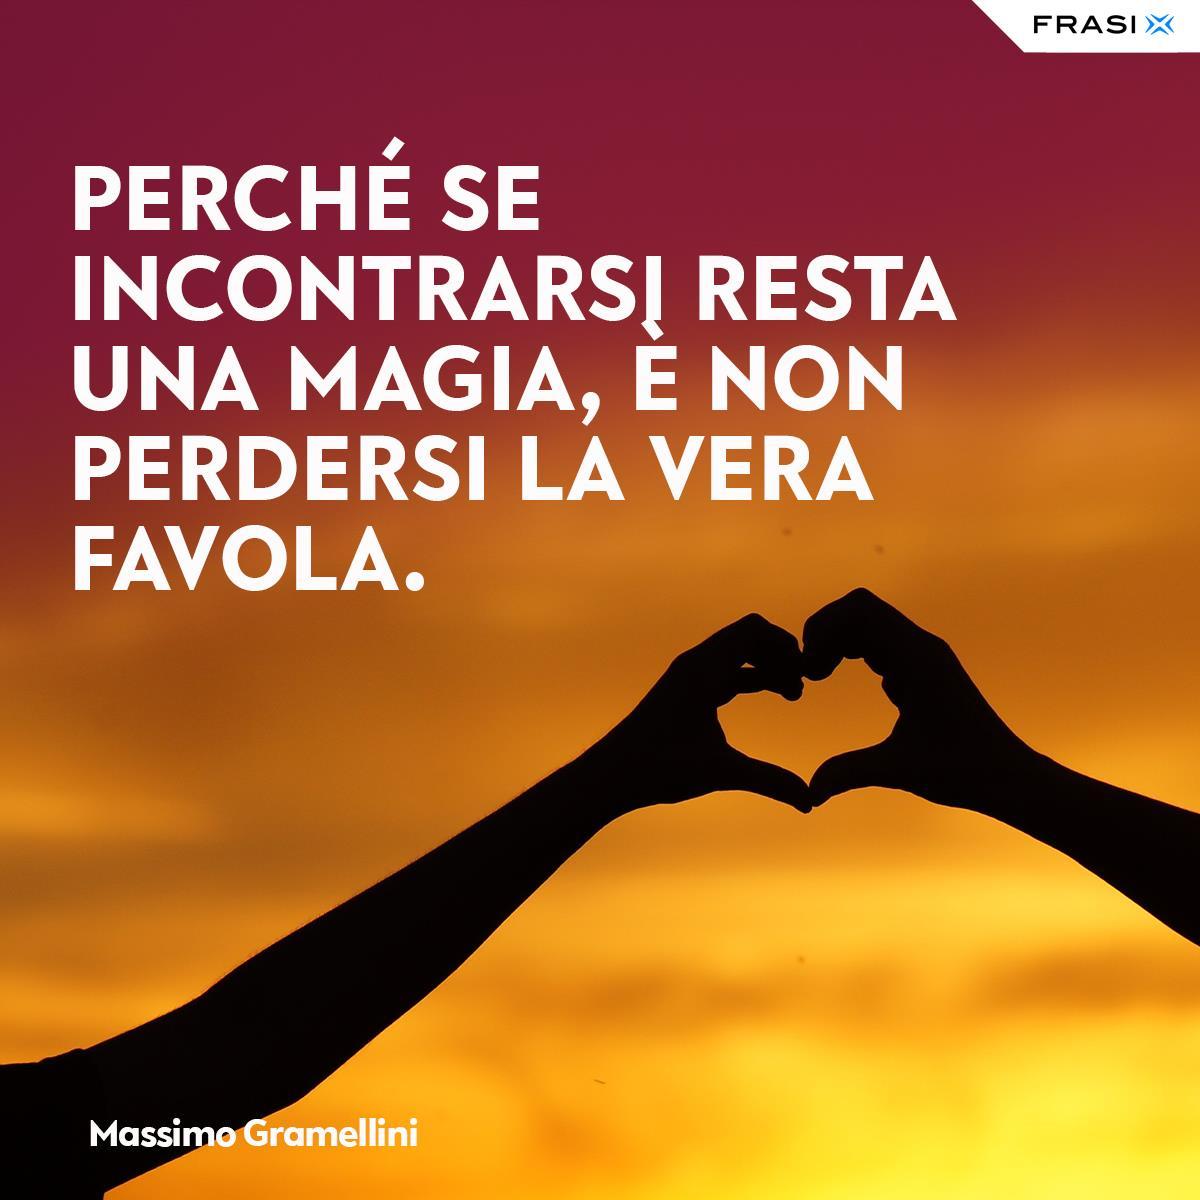 Frasi d'amore eterno Massimo Gramellini